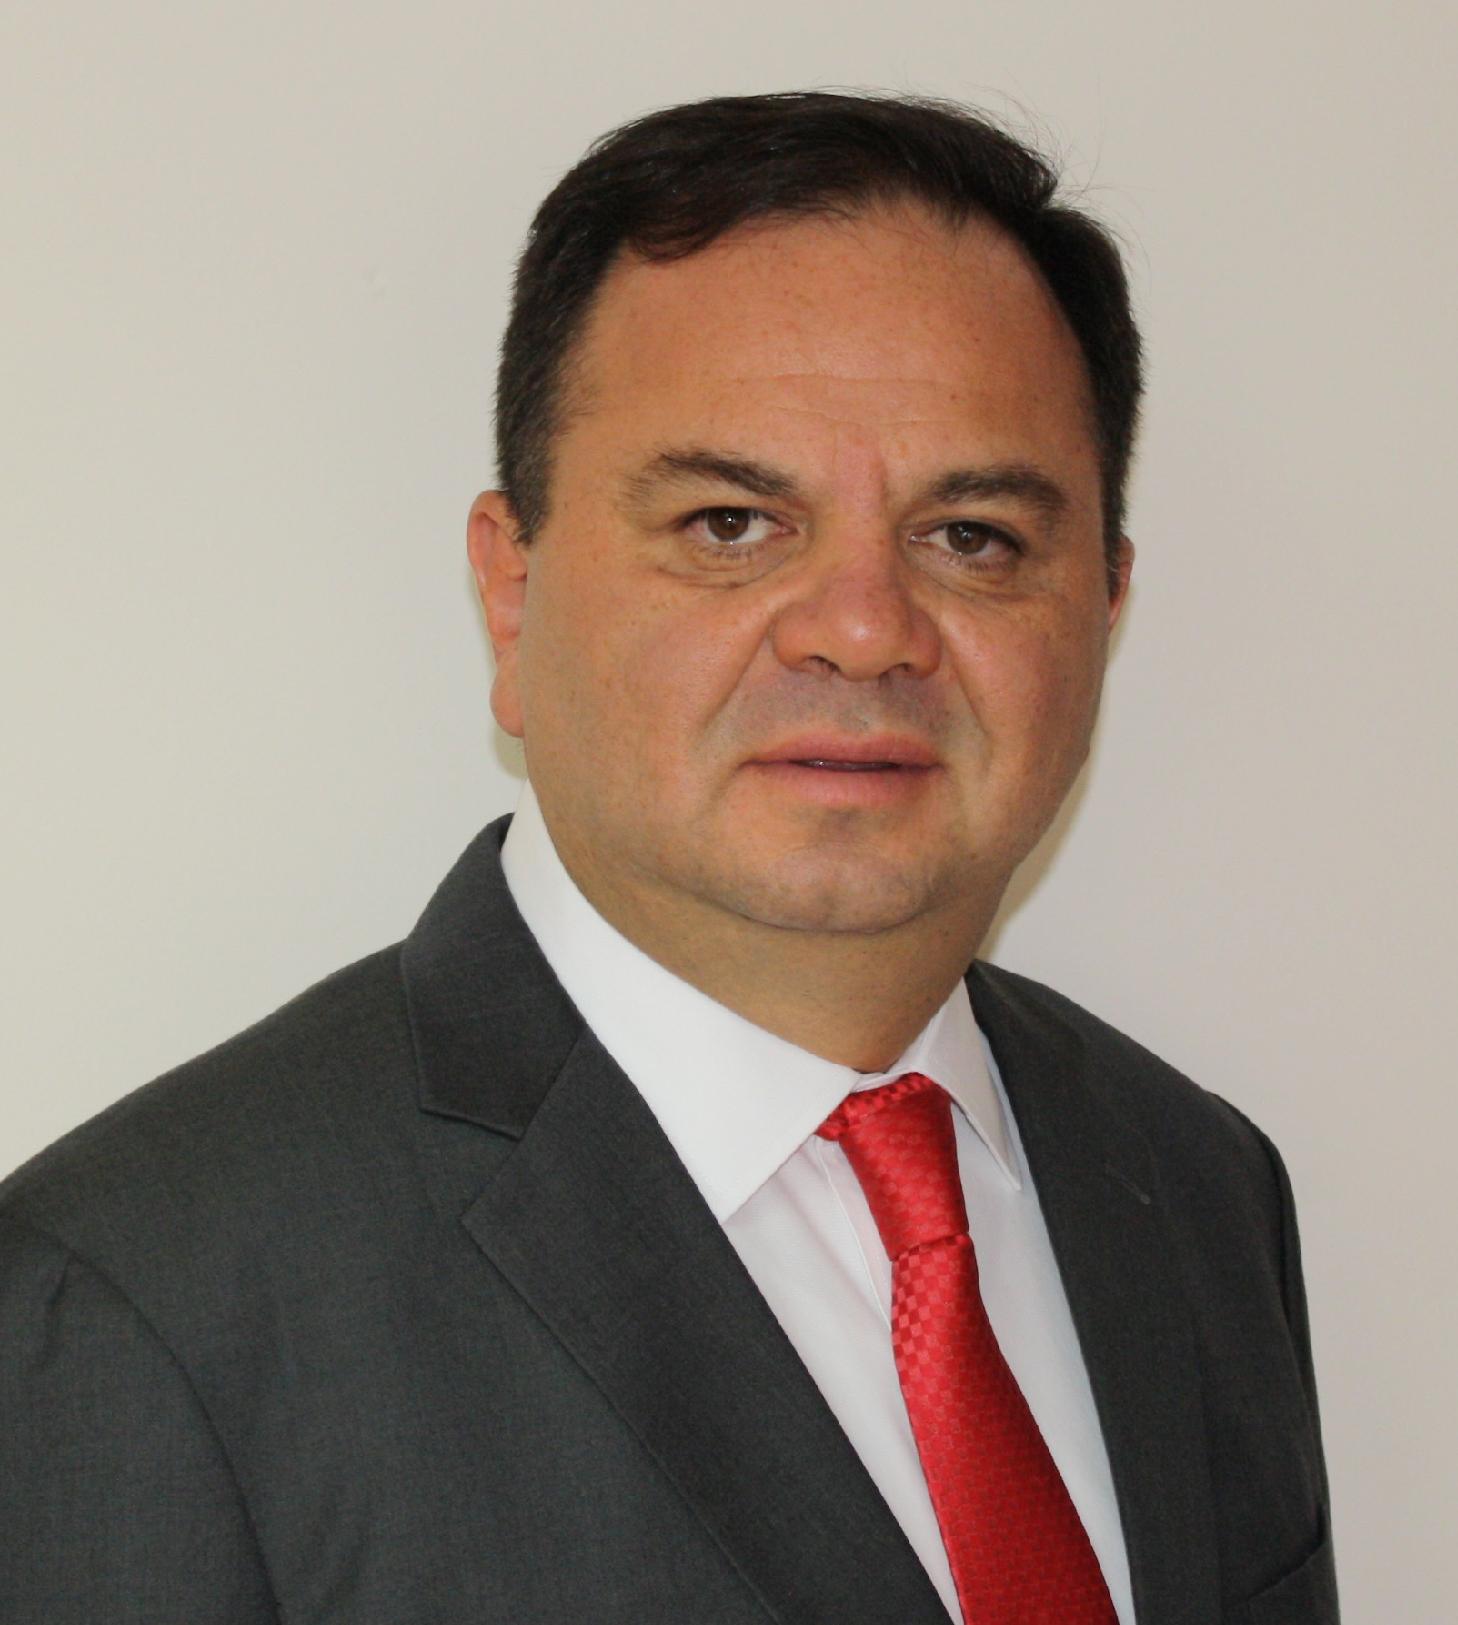 Dr. Jesús Rodríguez Almeida